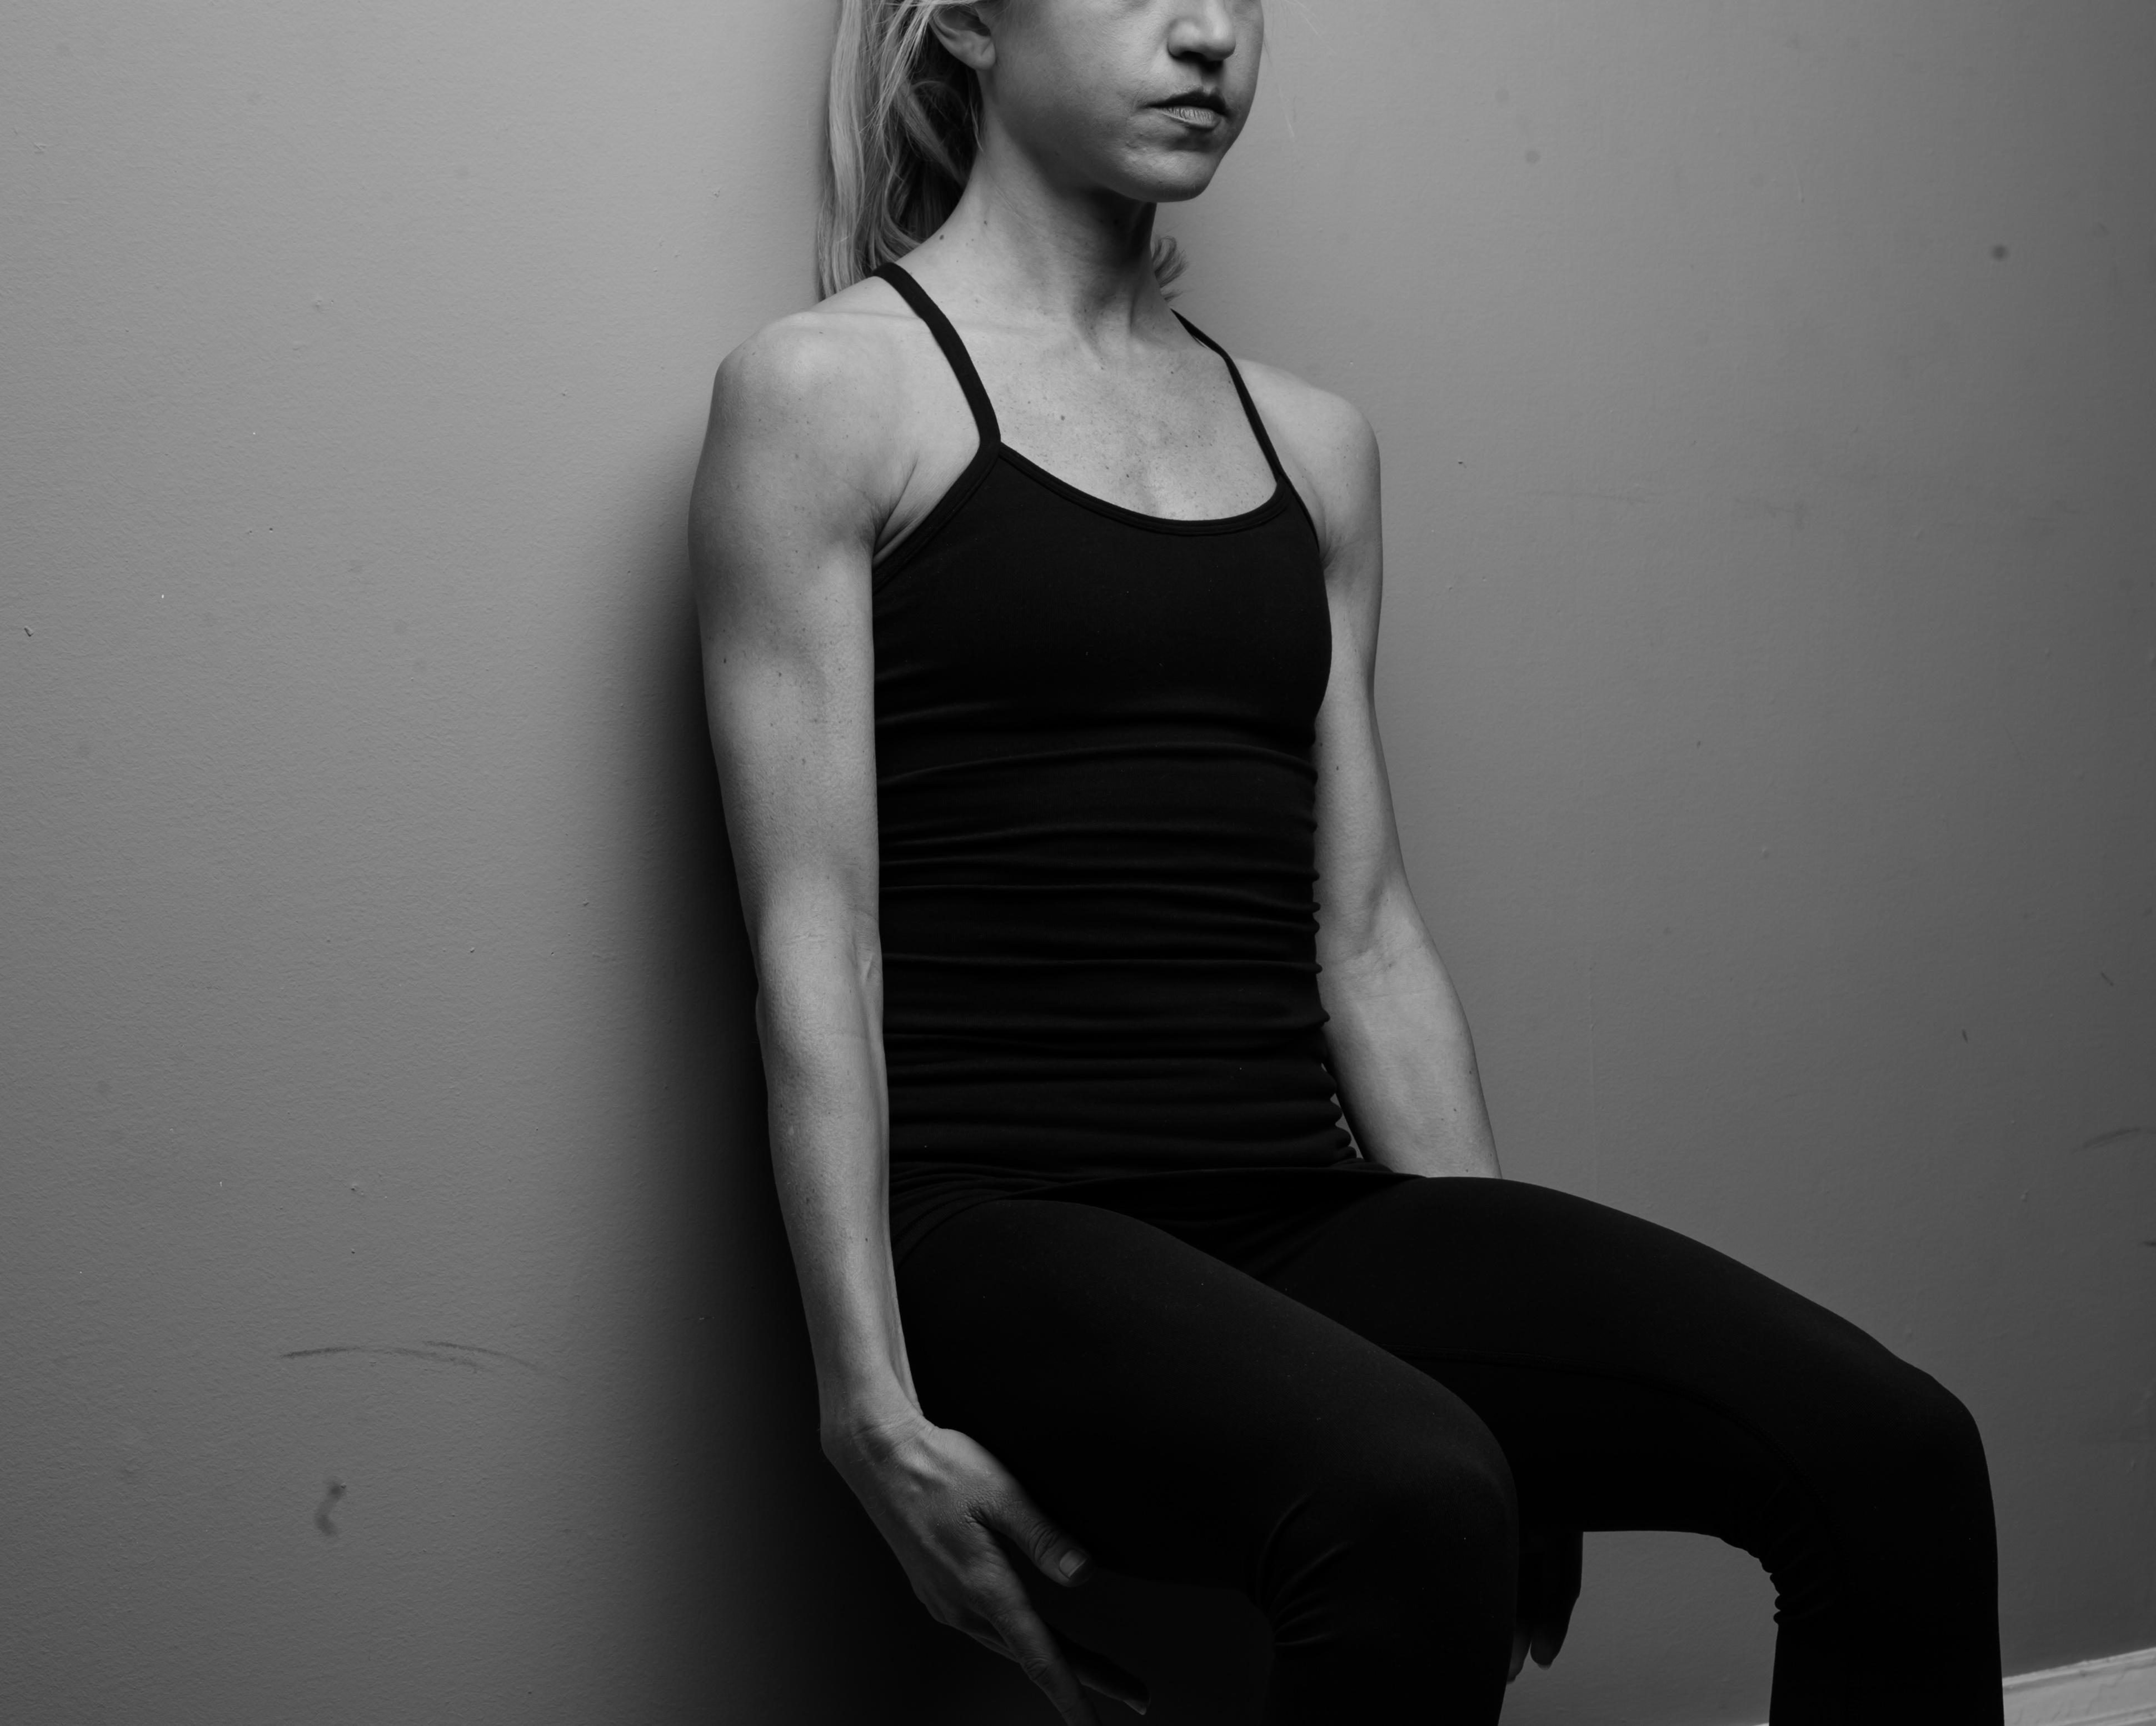 wall-squat